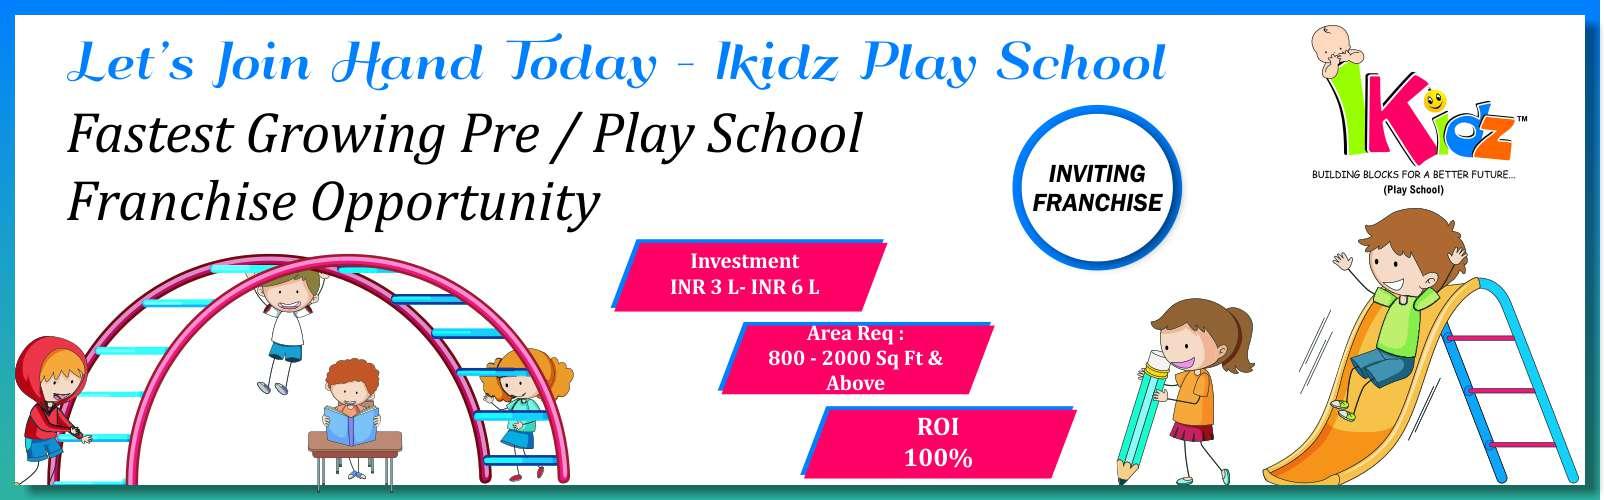 admin/photos/Ikidz Play School